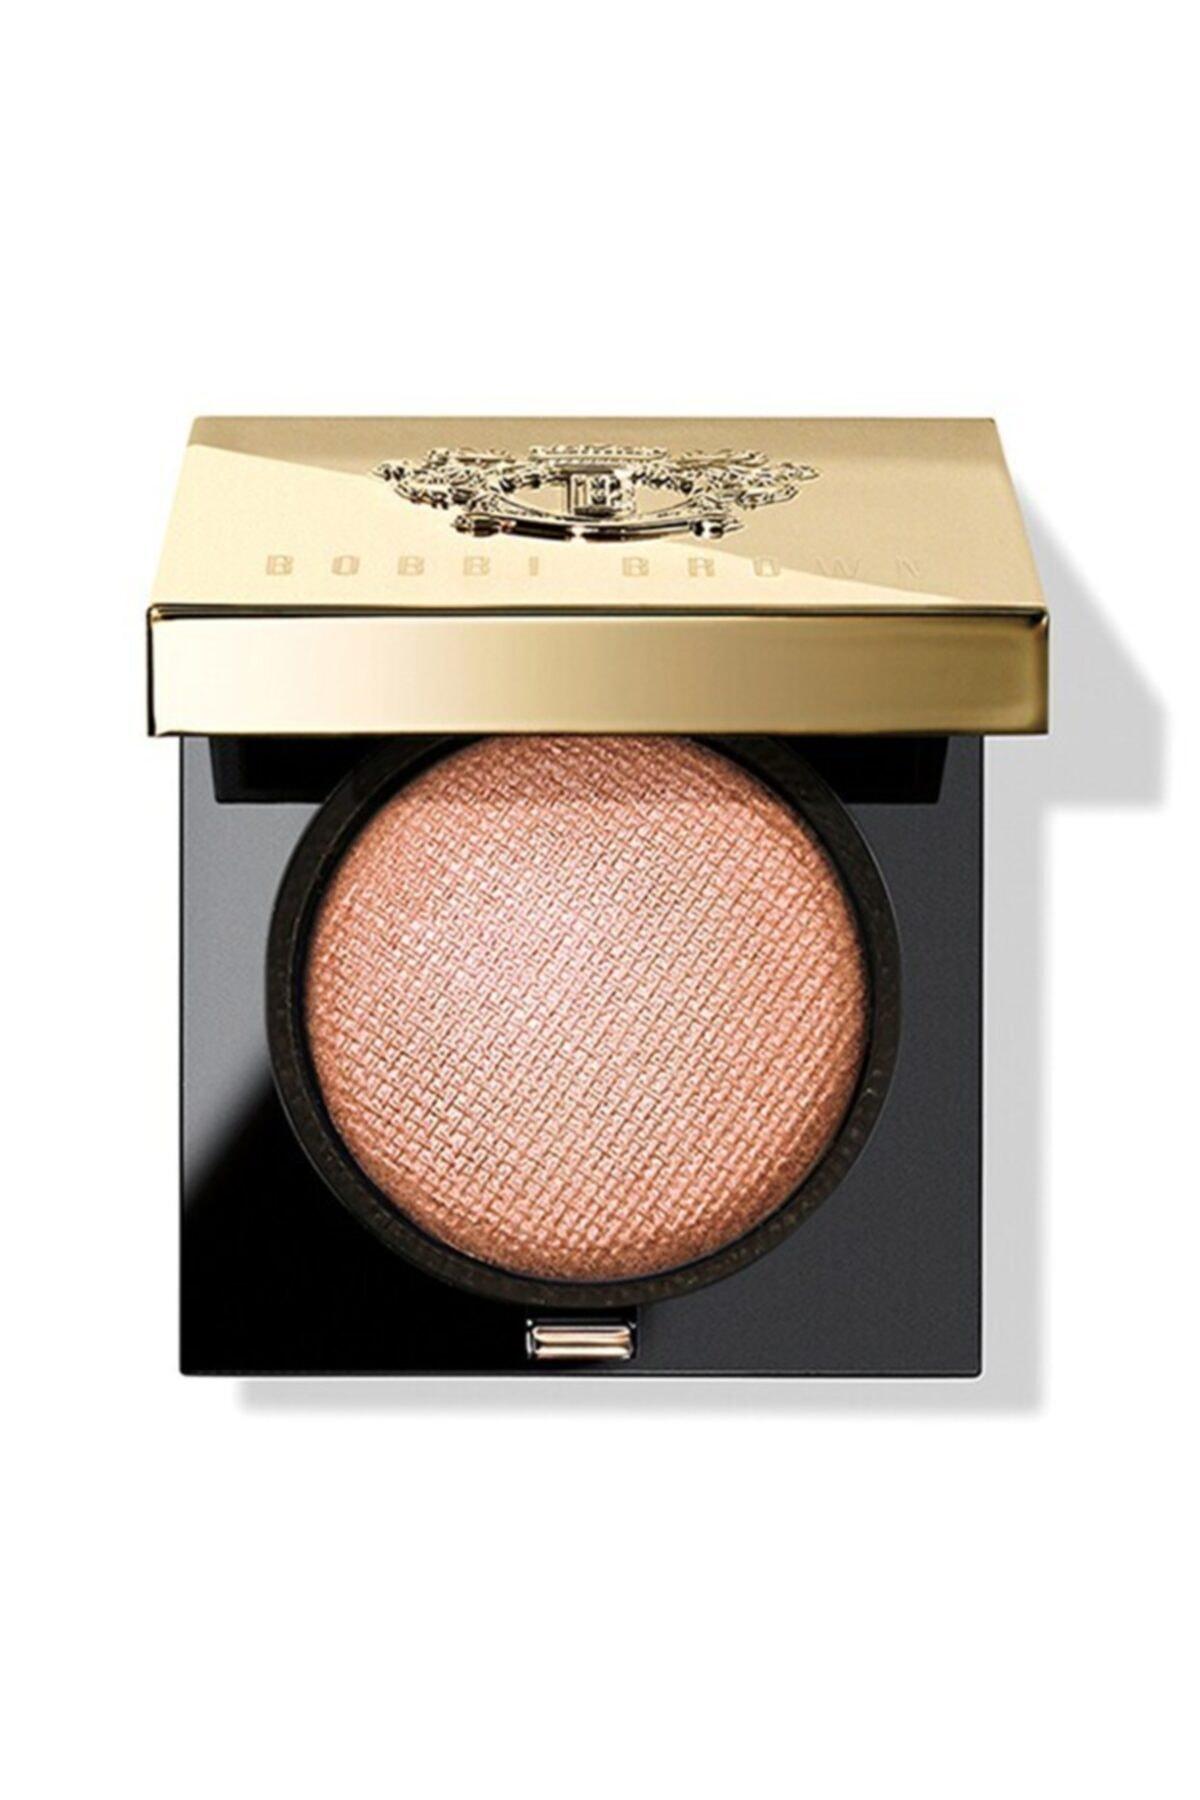 BOBBI BROWN Göz Farı - Luxe Eye Shadow Melting Point 2.5 g 716170196626 2